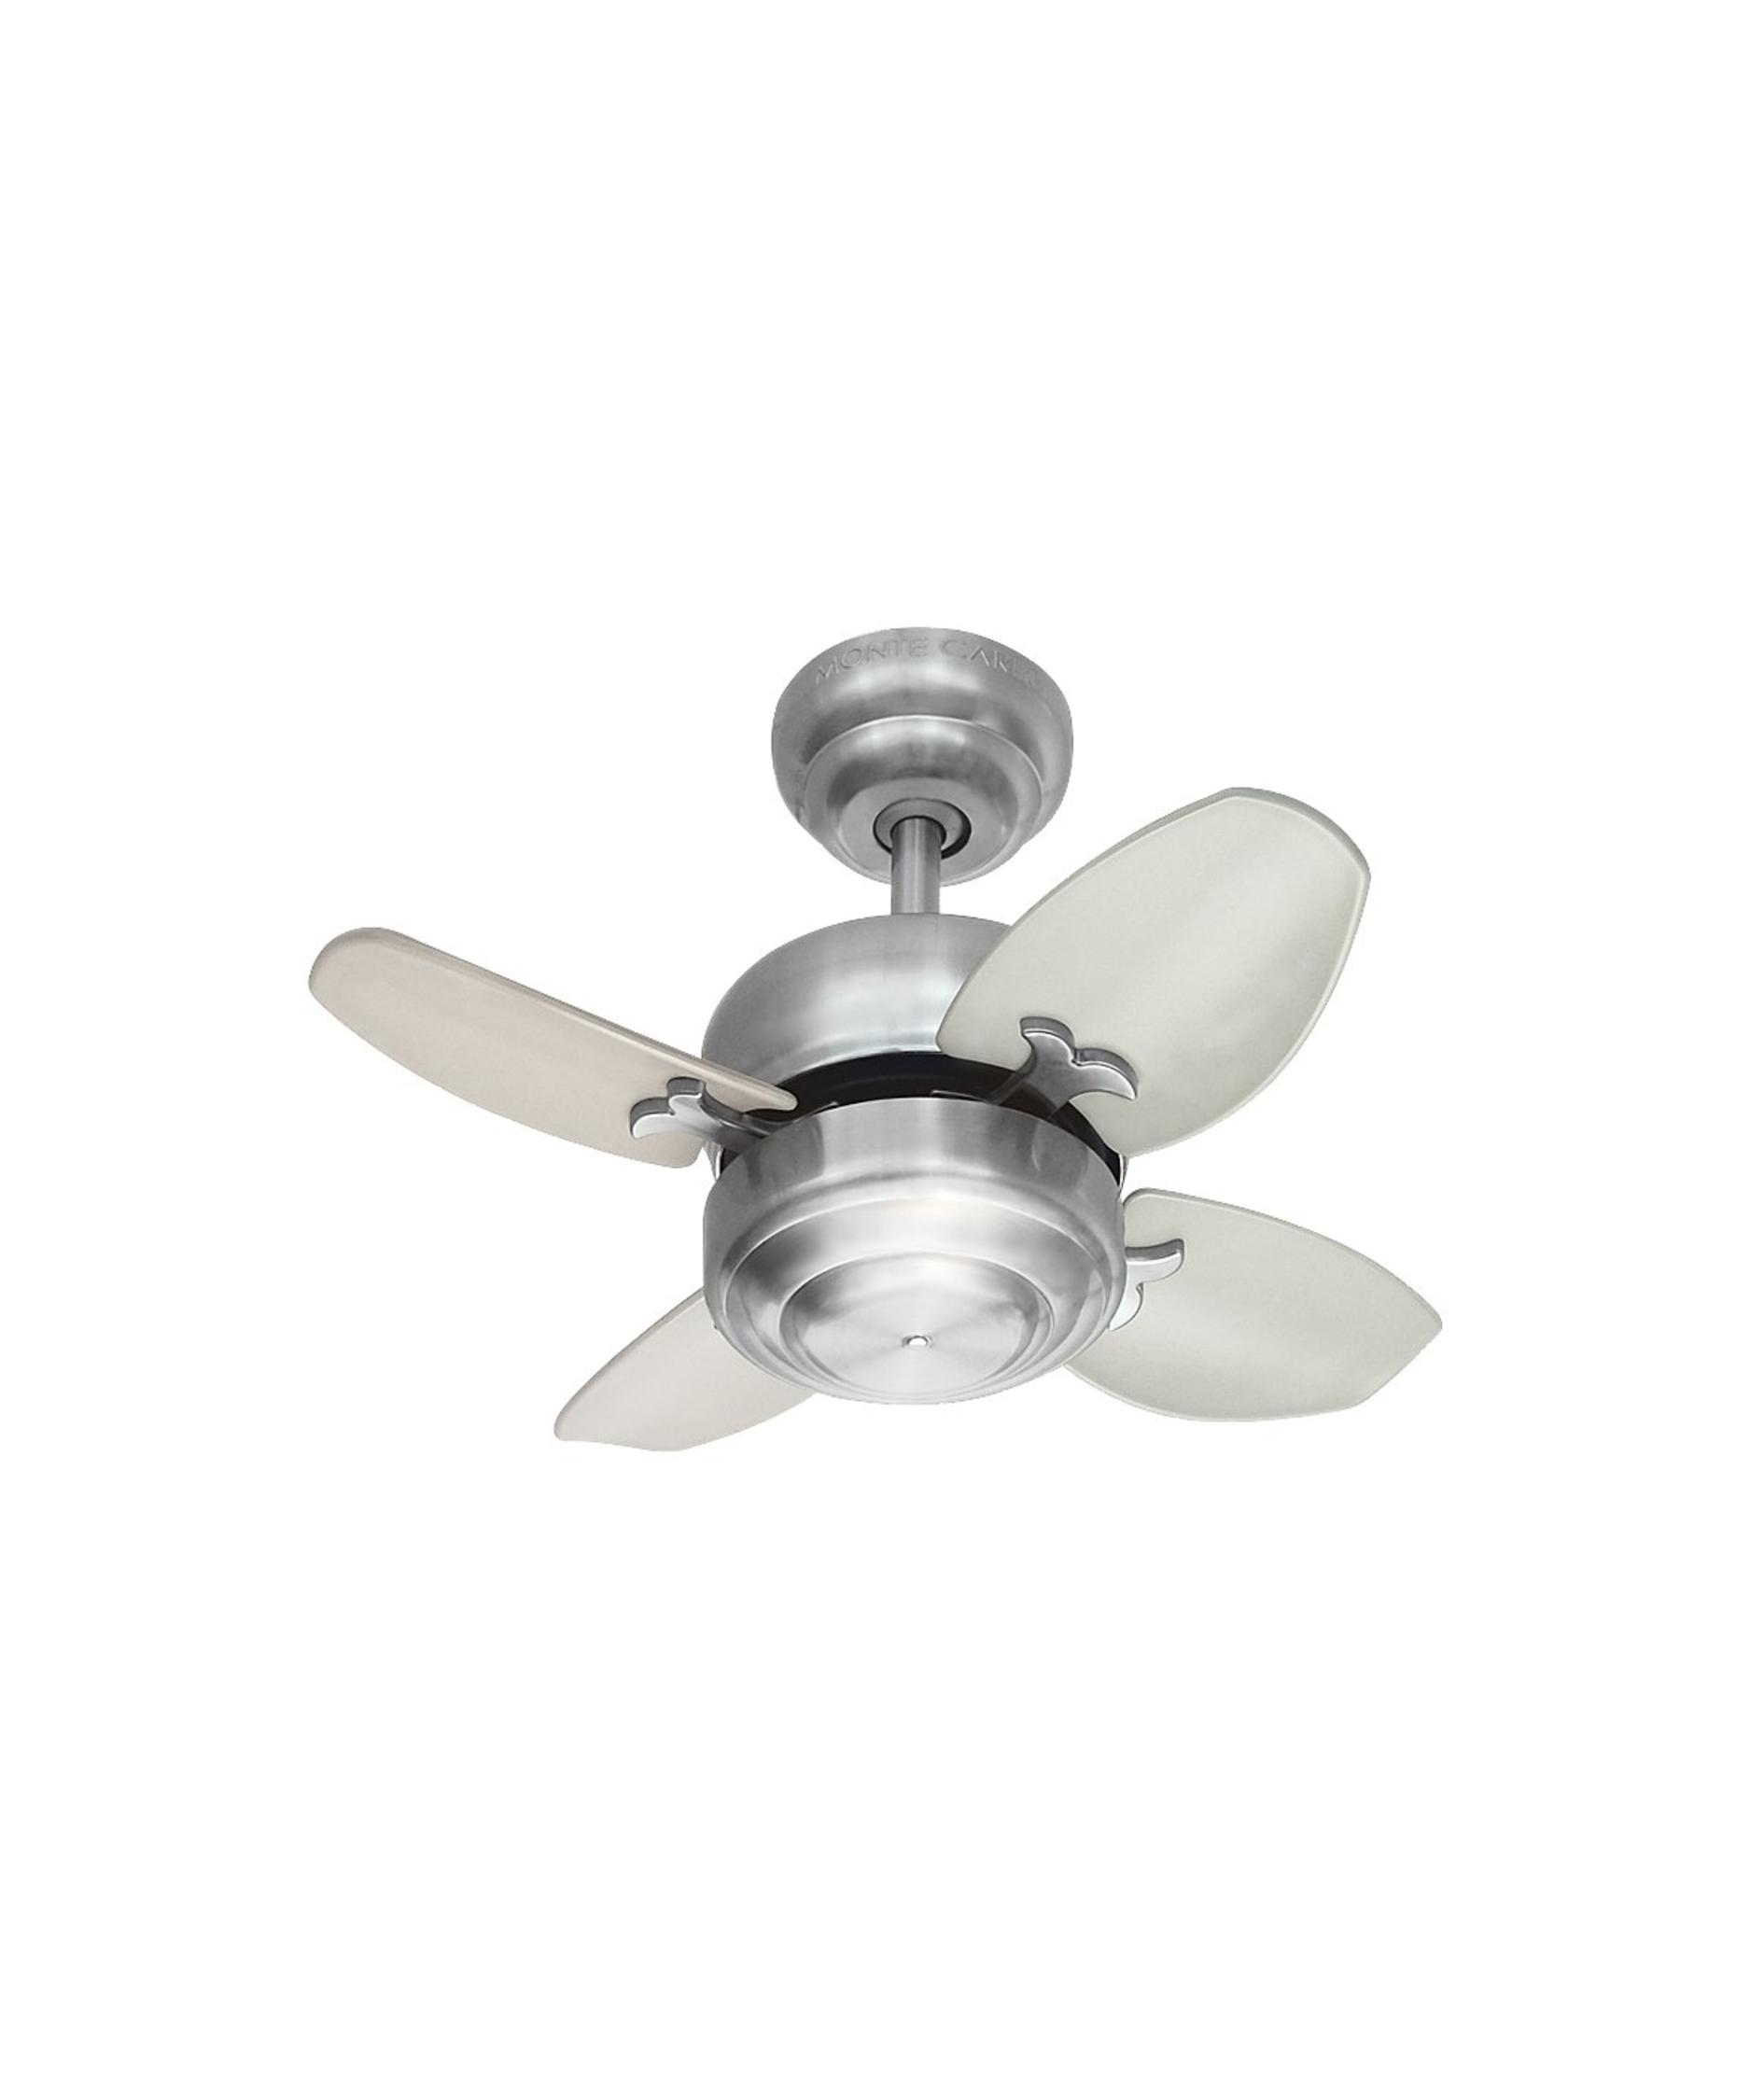 monte carlo mini ceiling fan photo - 2